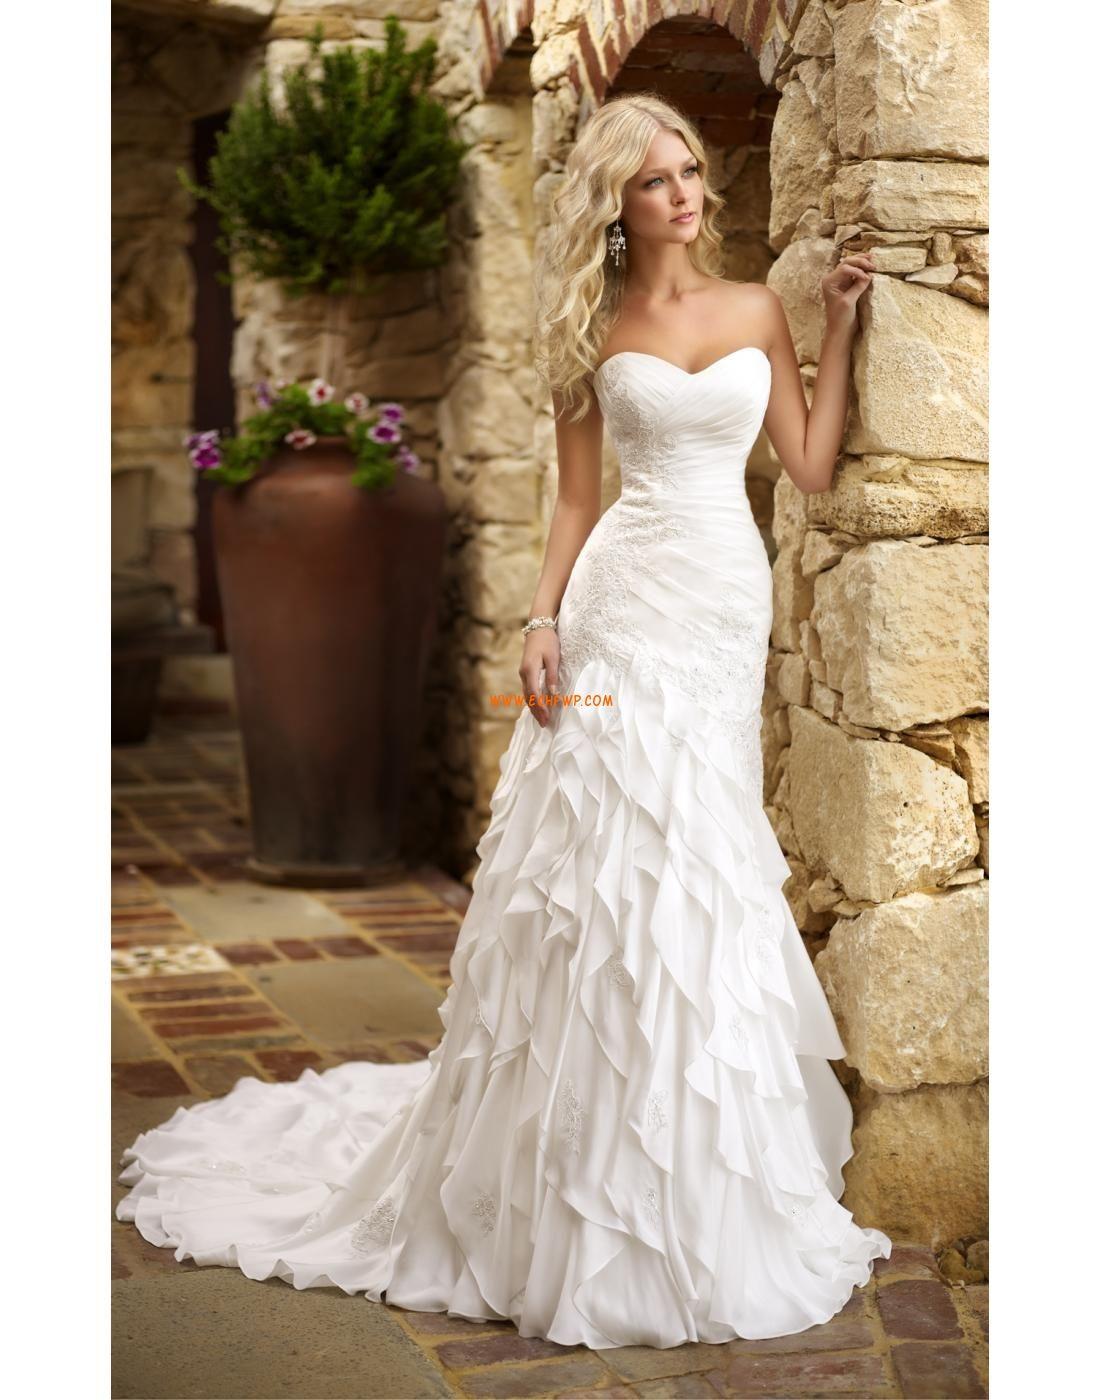 Sir ne satin brillant s duisant robes de mari e 2014 for Concepteurs de robe de mariage australien en ligne